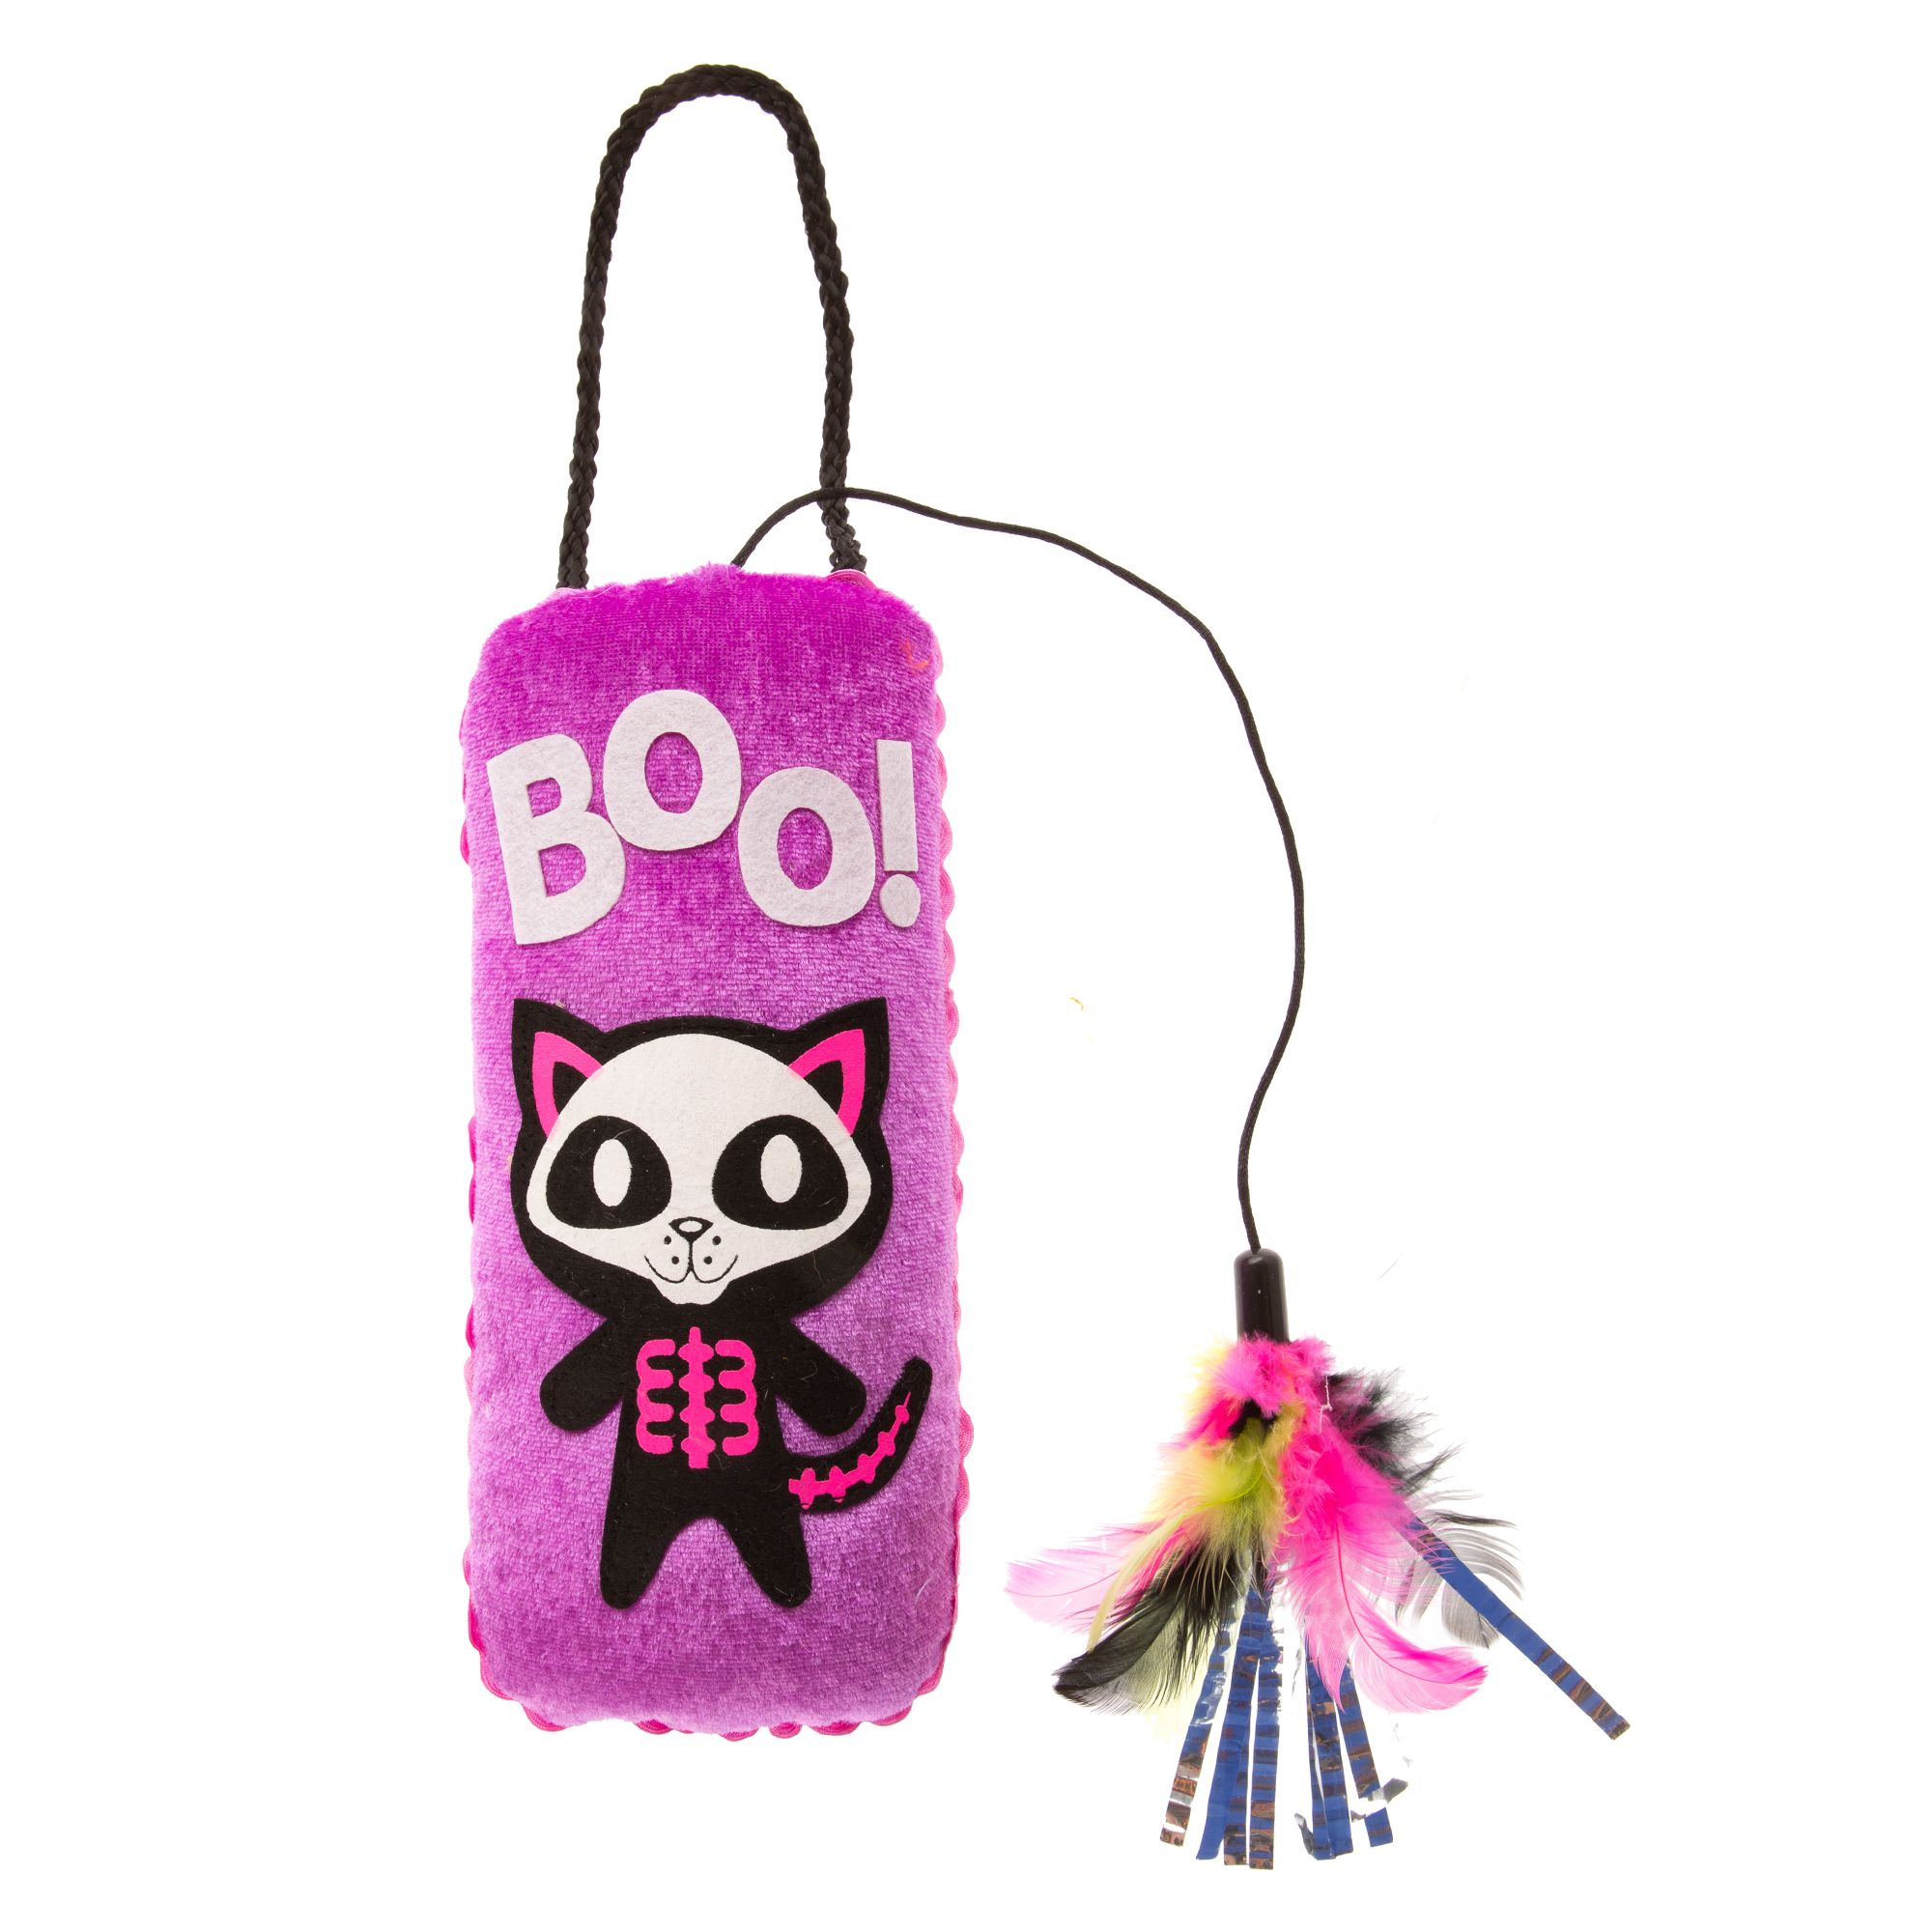 Thrills and Chills, Pet Halloween Dangler Black Cat Toy 5252844